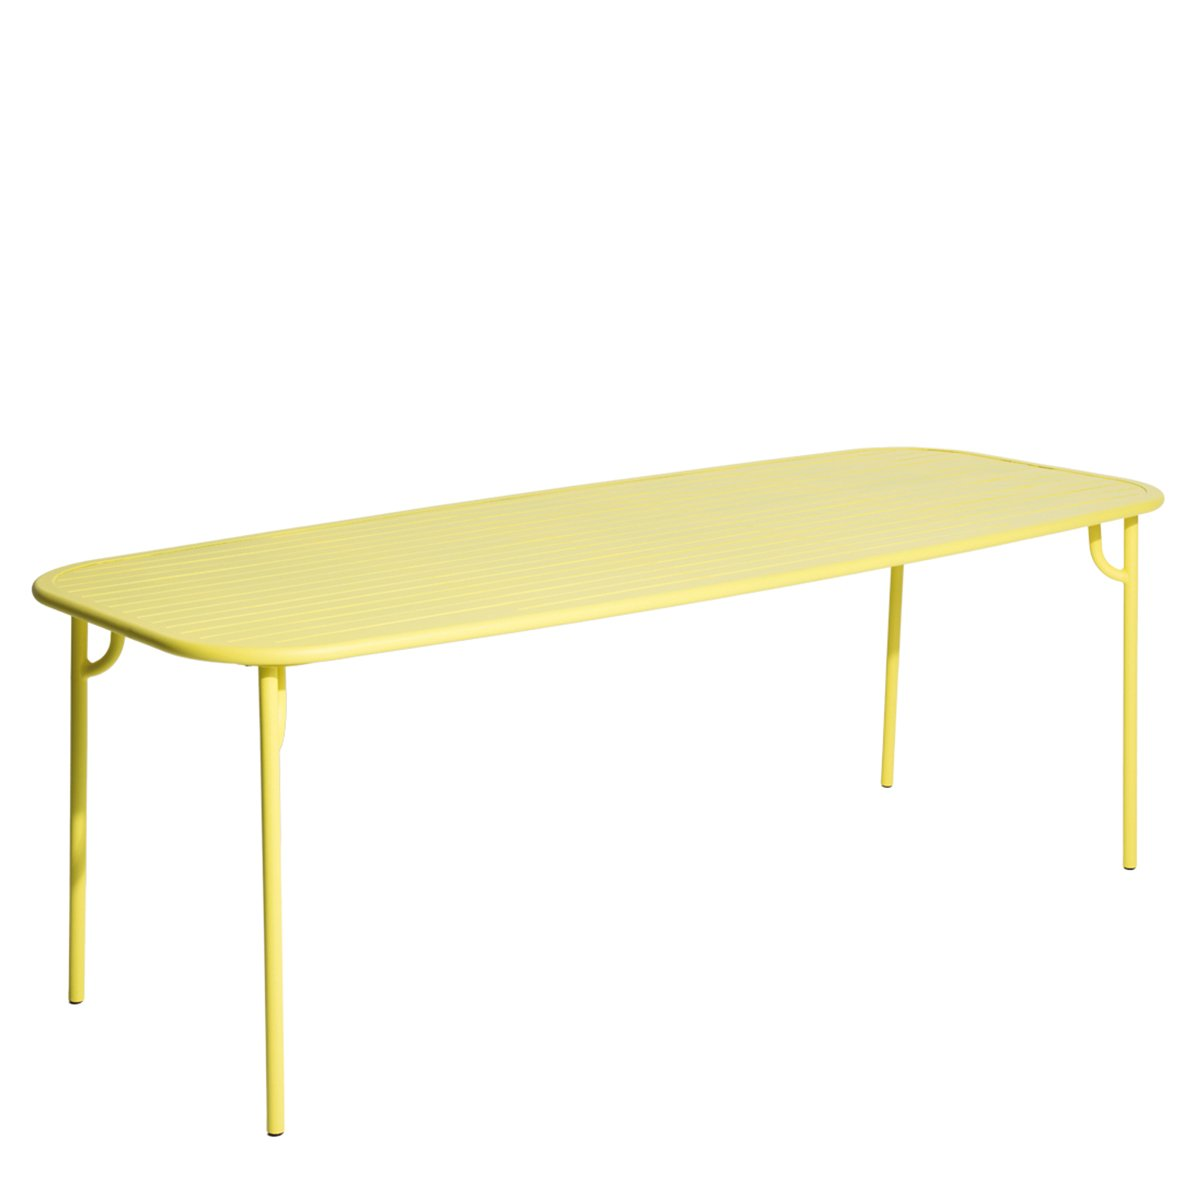 Petite Friture Week-end Eettafel Rechthoek - Large/Yellow